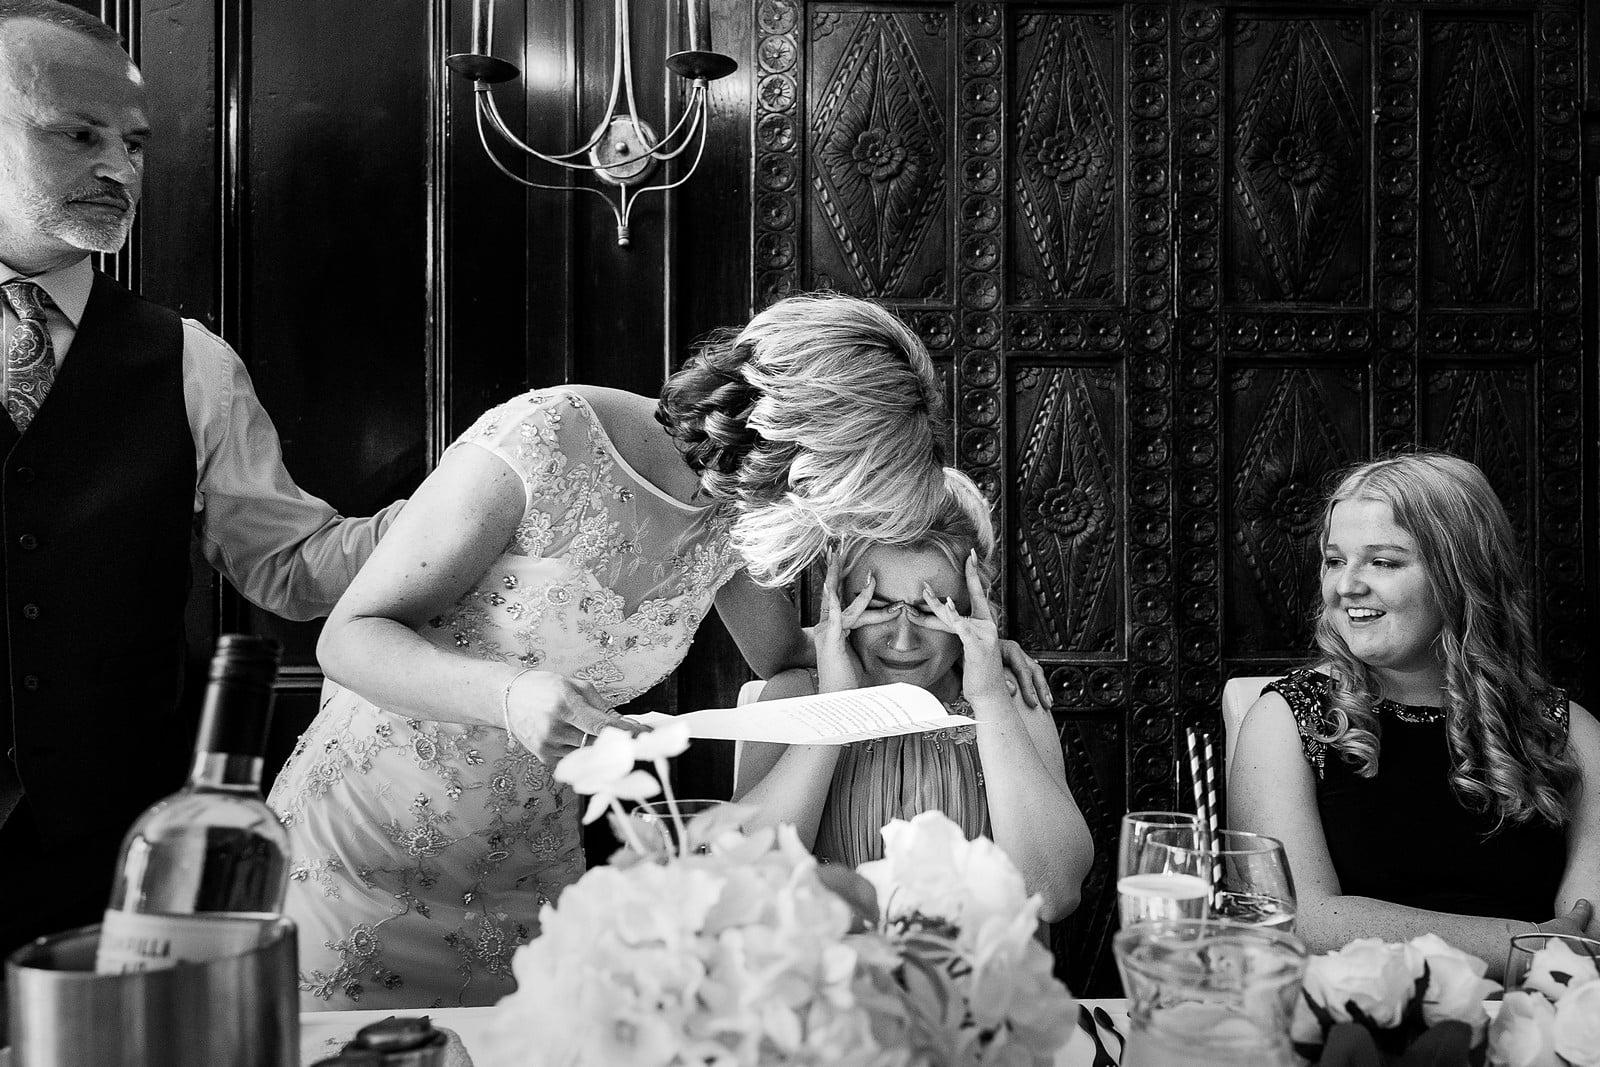 best of 2019 - Trenython Manor wedding photographer 009